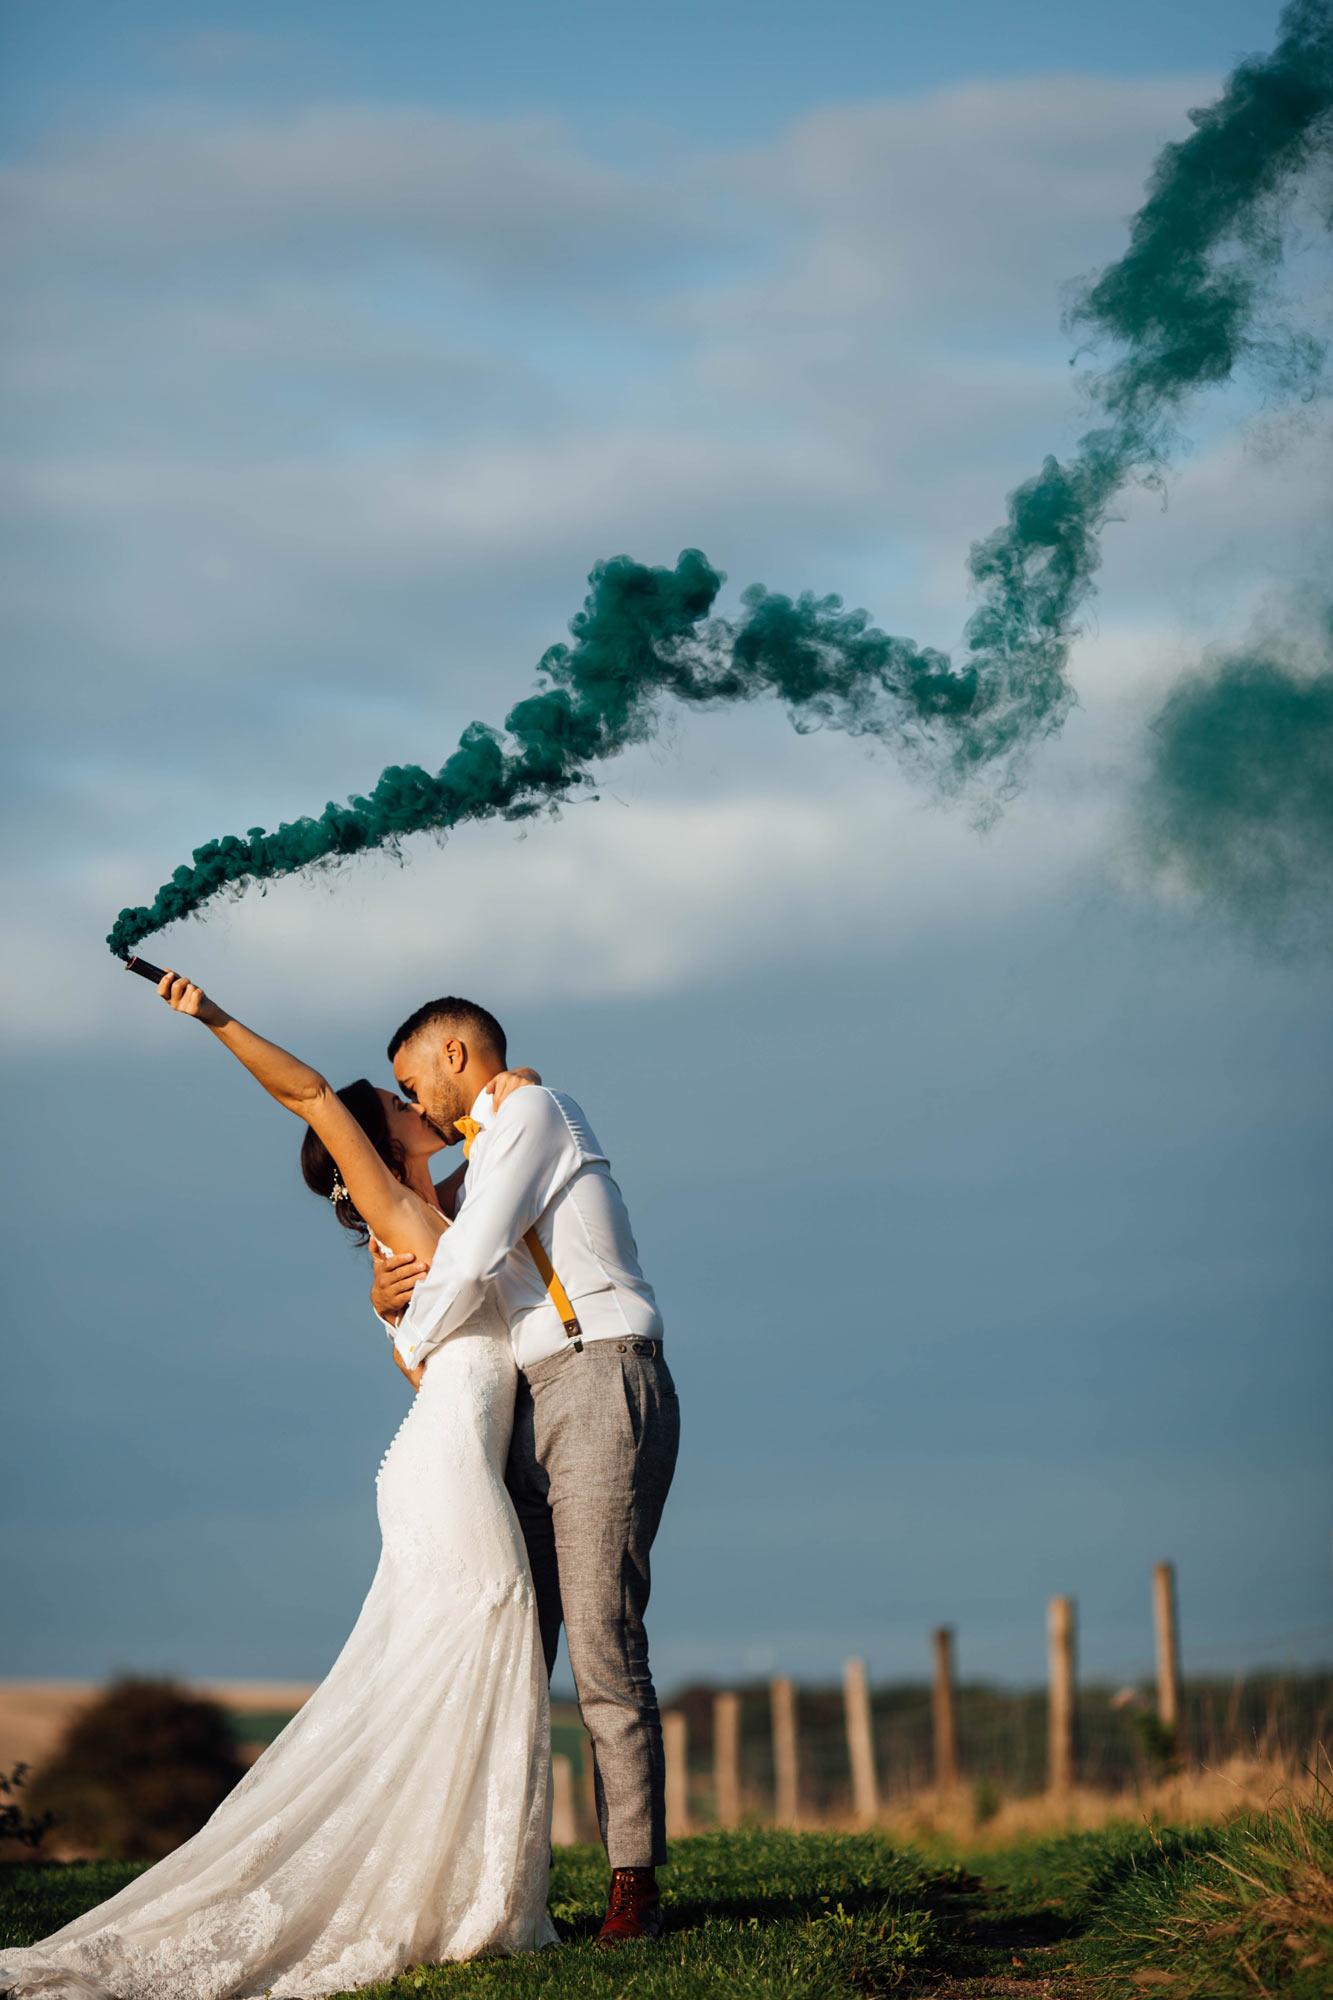 BeckyLee-wedding12.jpg